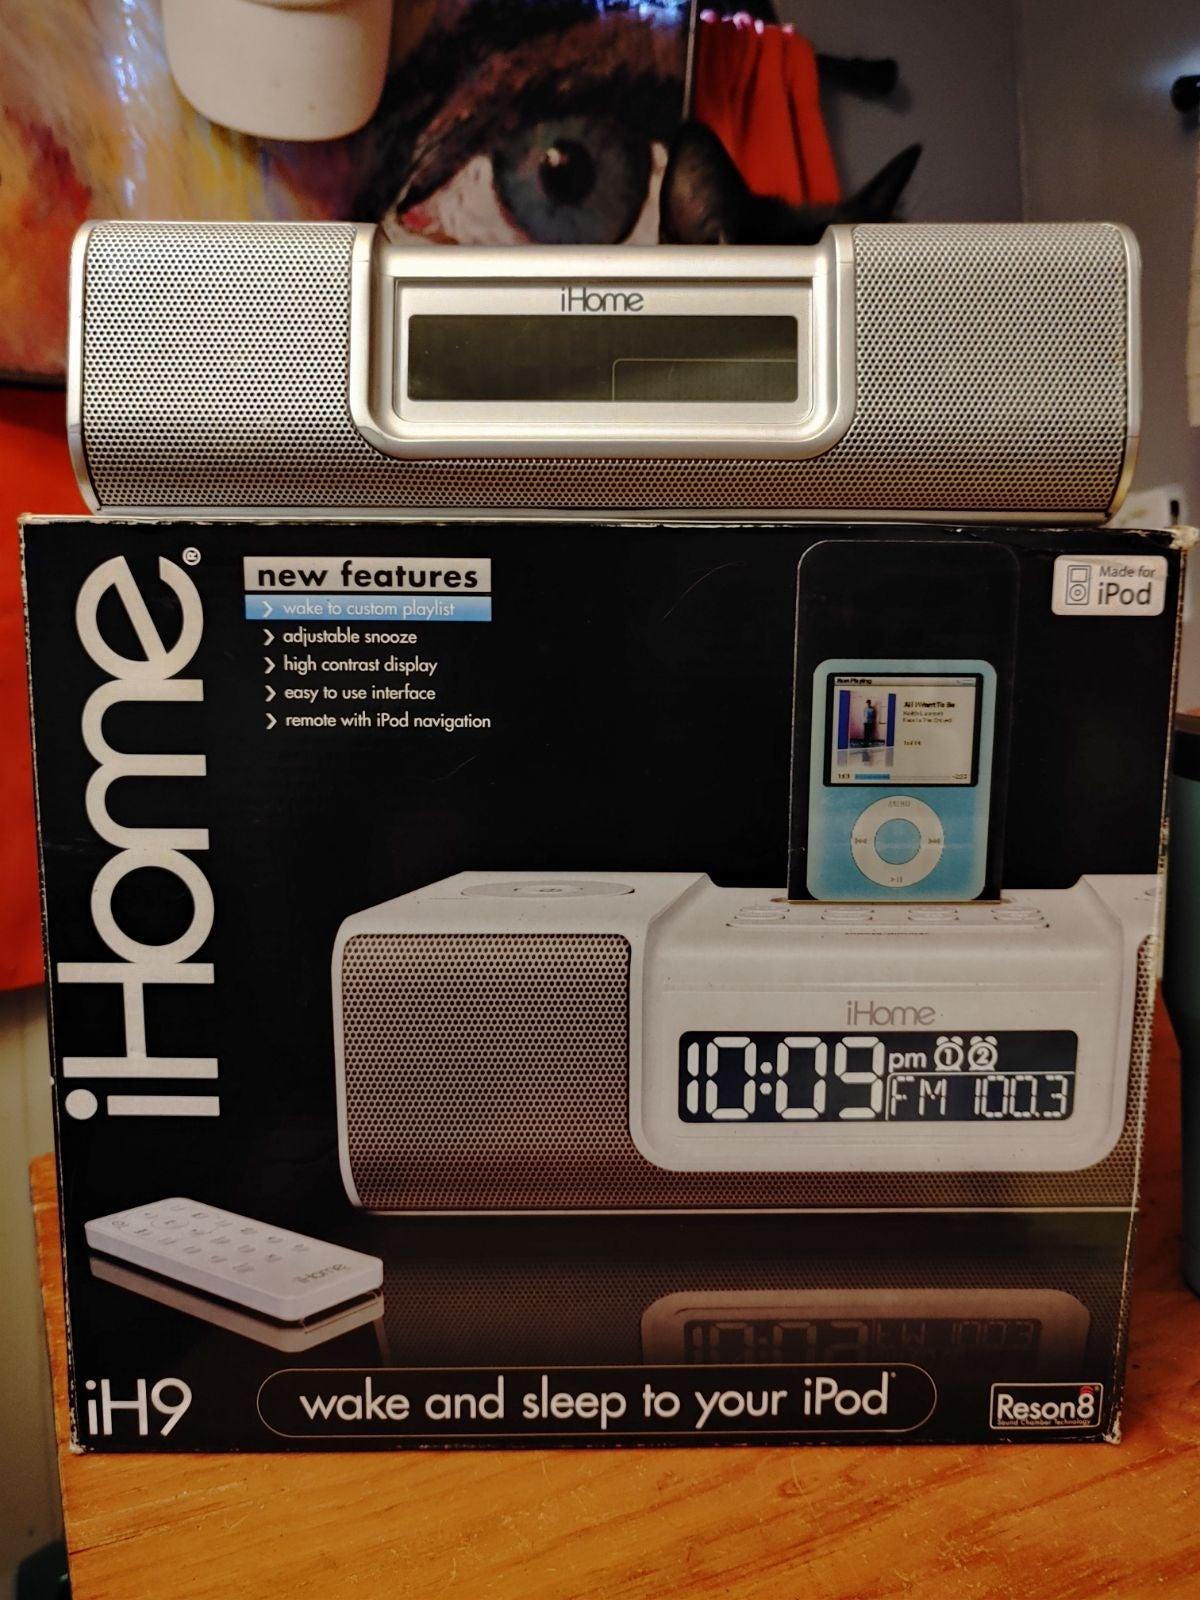 IHome iH9 clock radio & audio system for